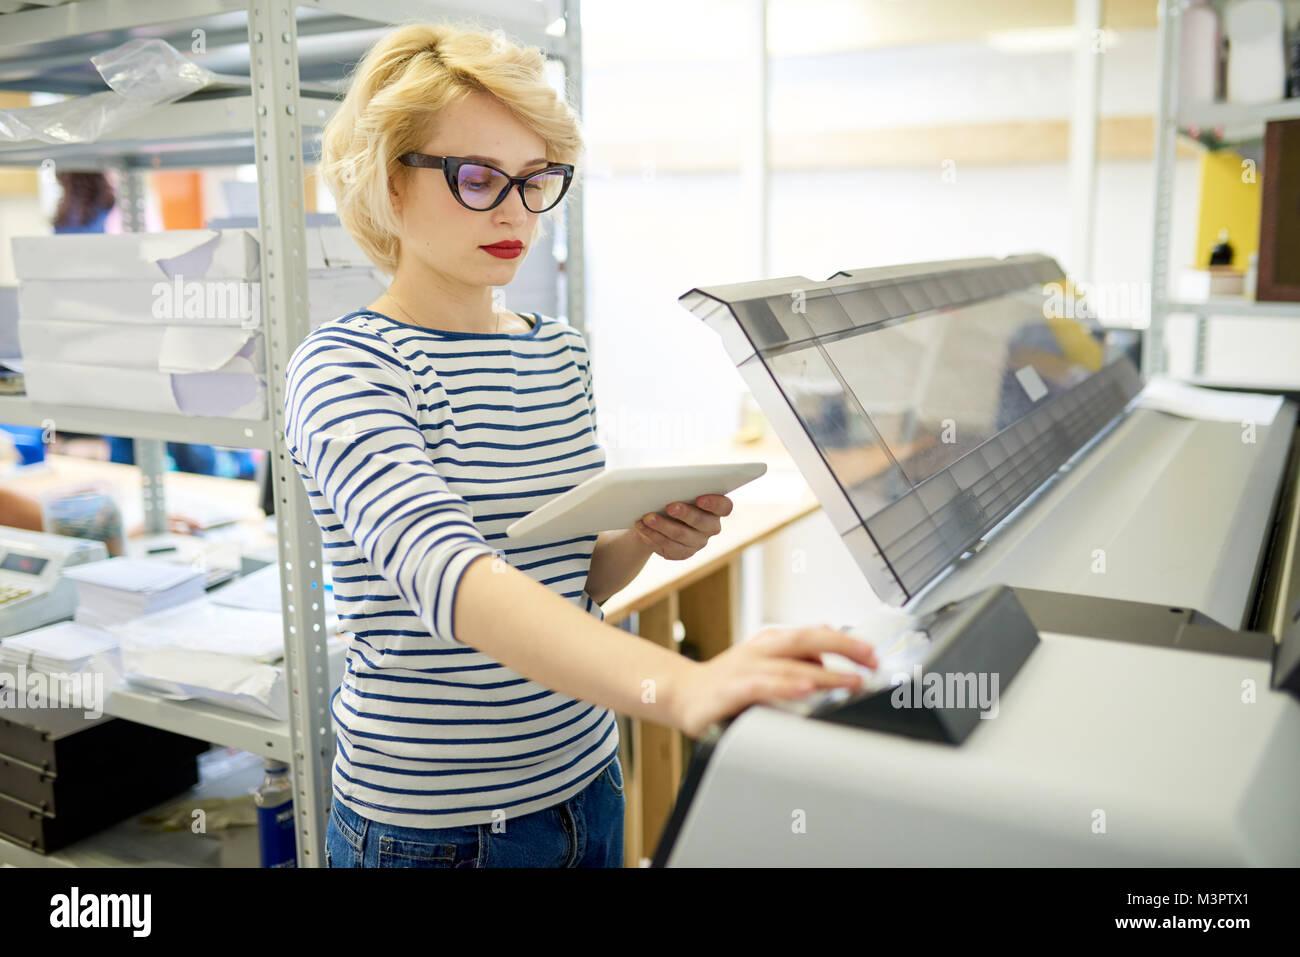 Modern Woman Using Plotter - Stock Image